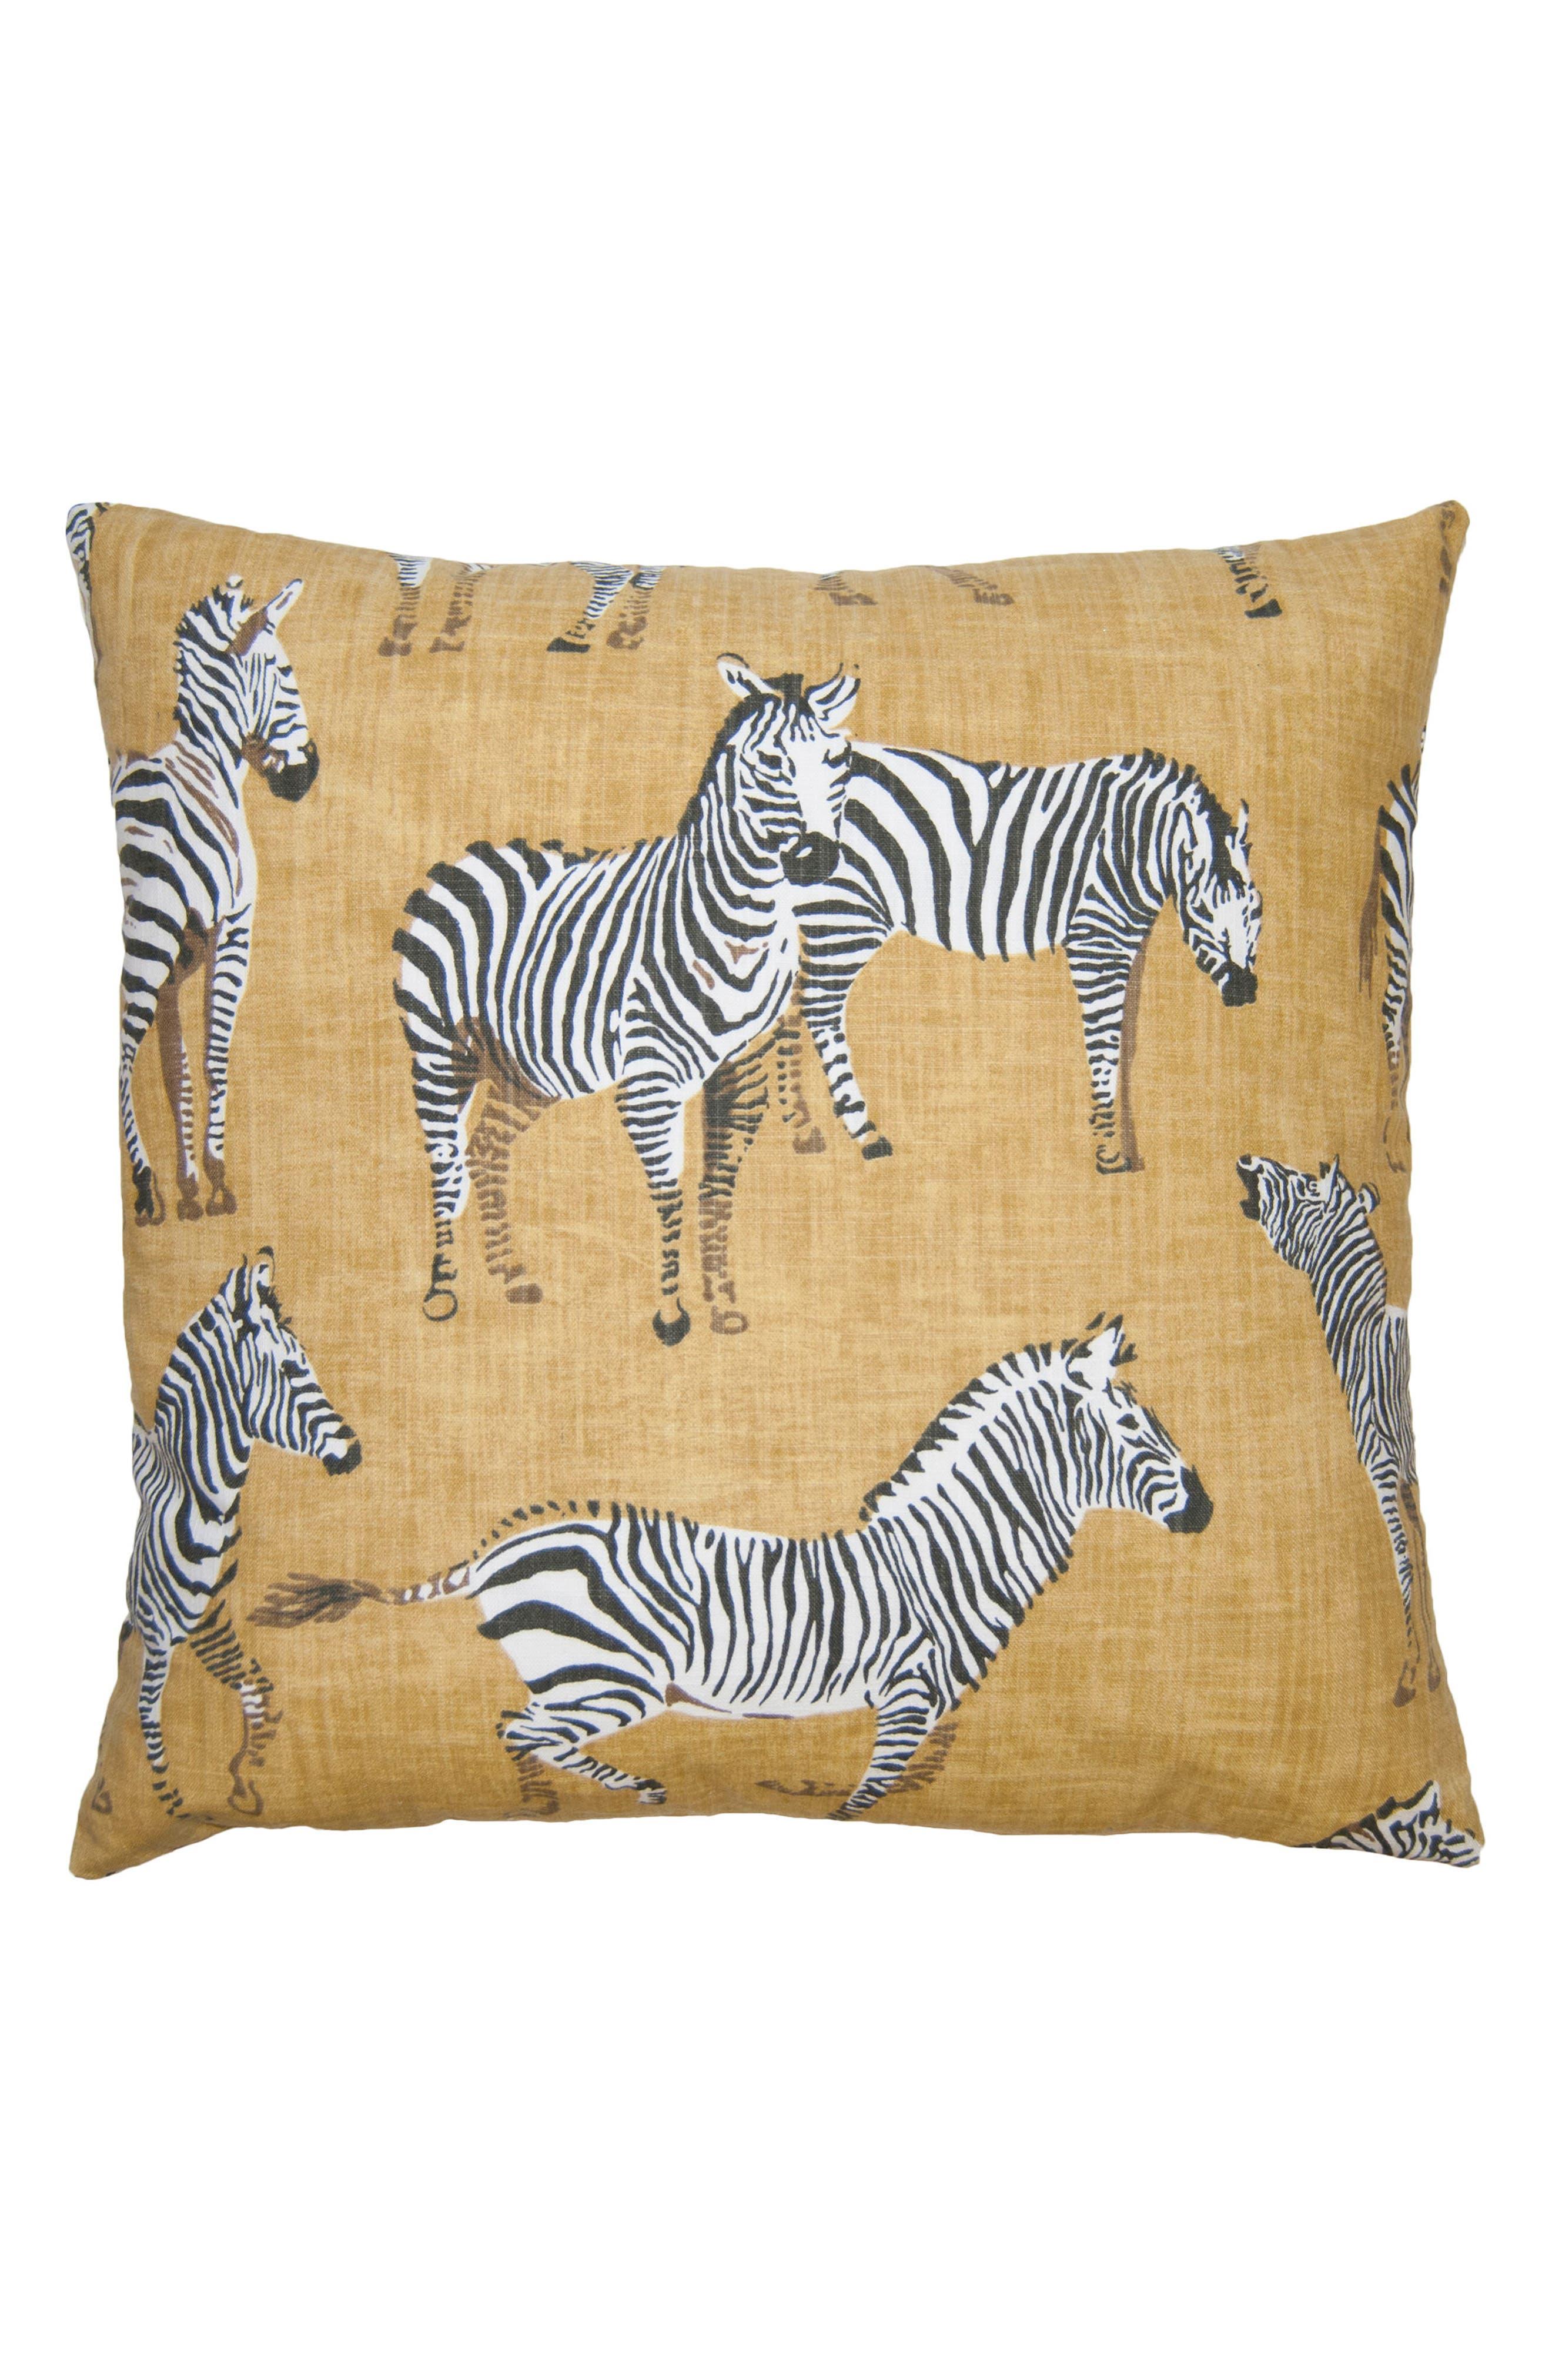 Kingdom Zebra Accent Pillow,                             Main thumbnail 1, color,                             TAN